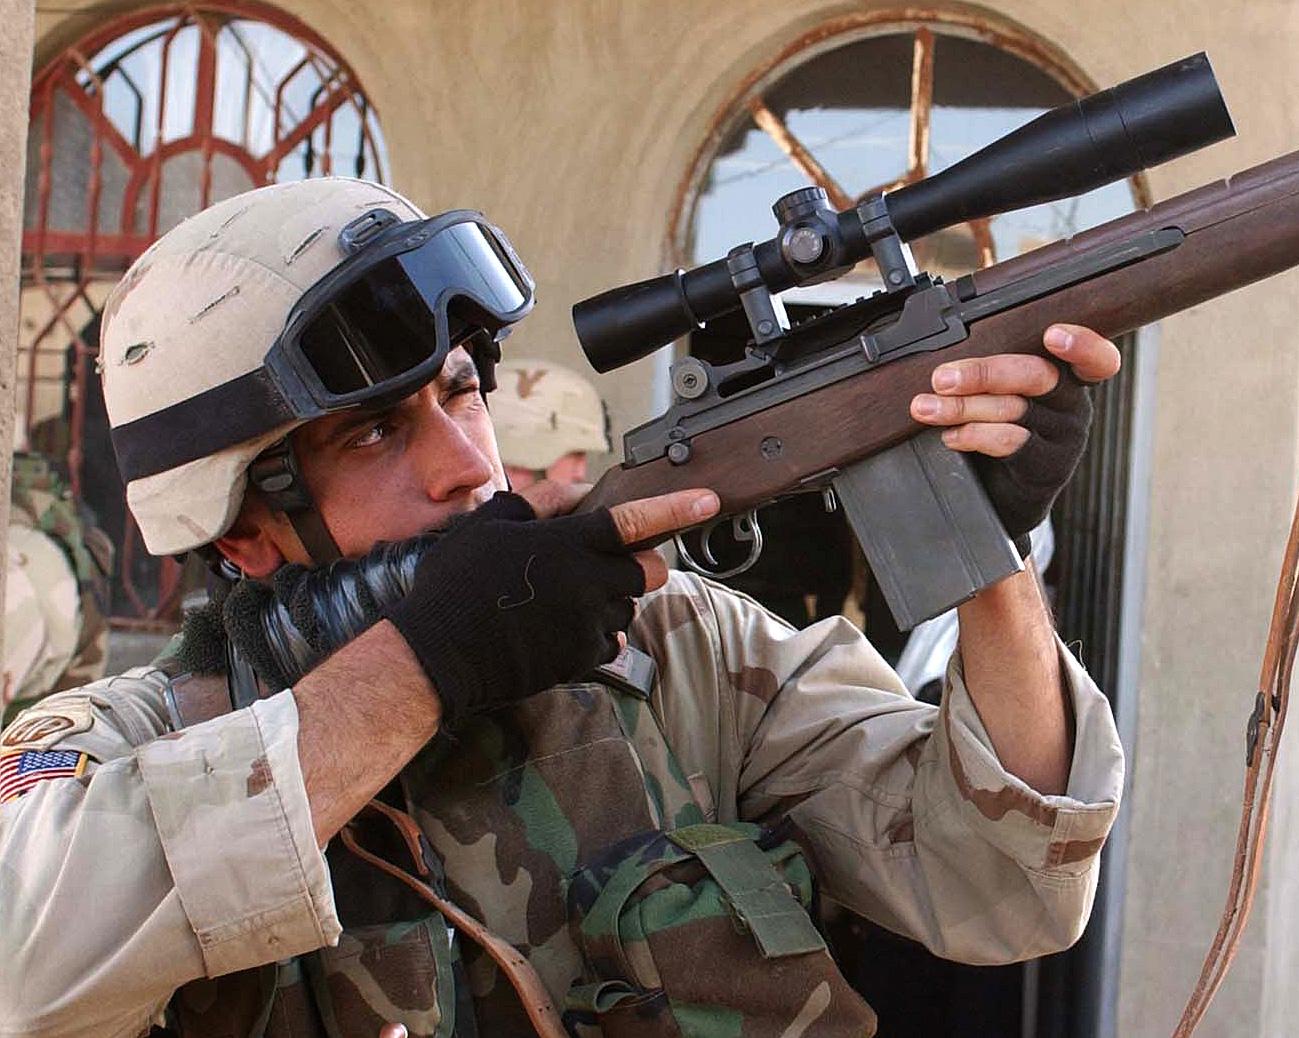 Sniper_rifle.jpg